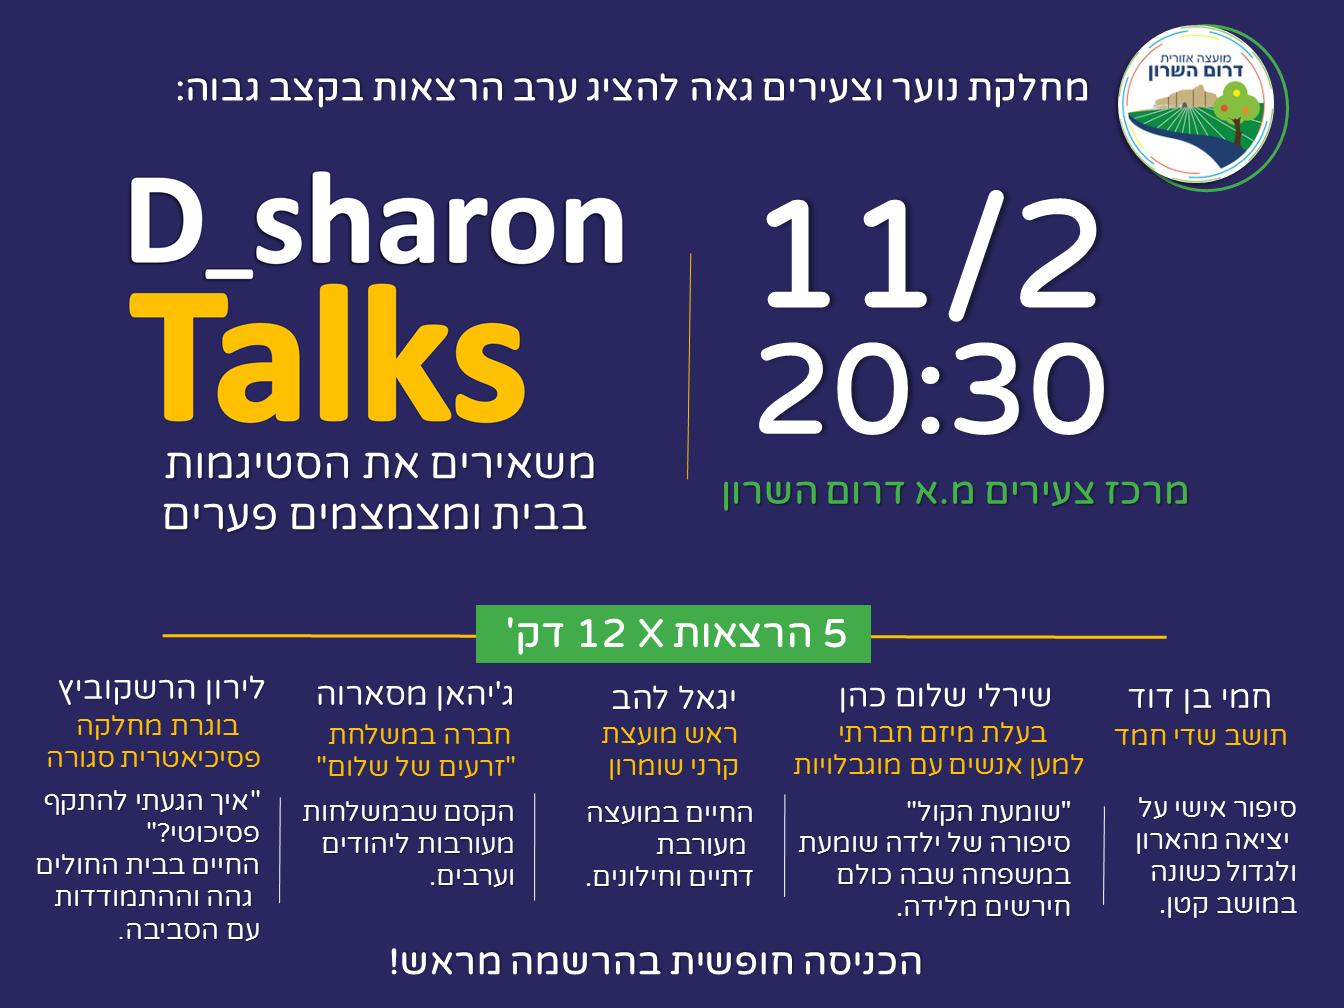 dsharon talk פרסום